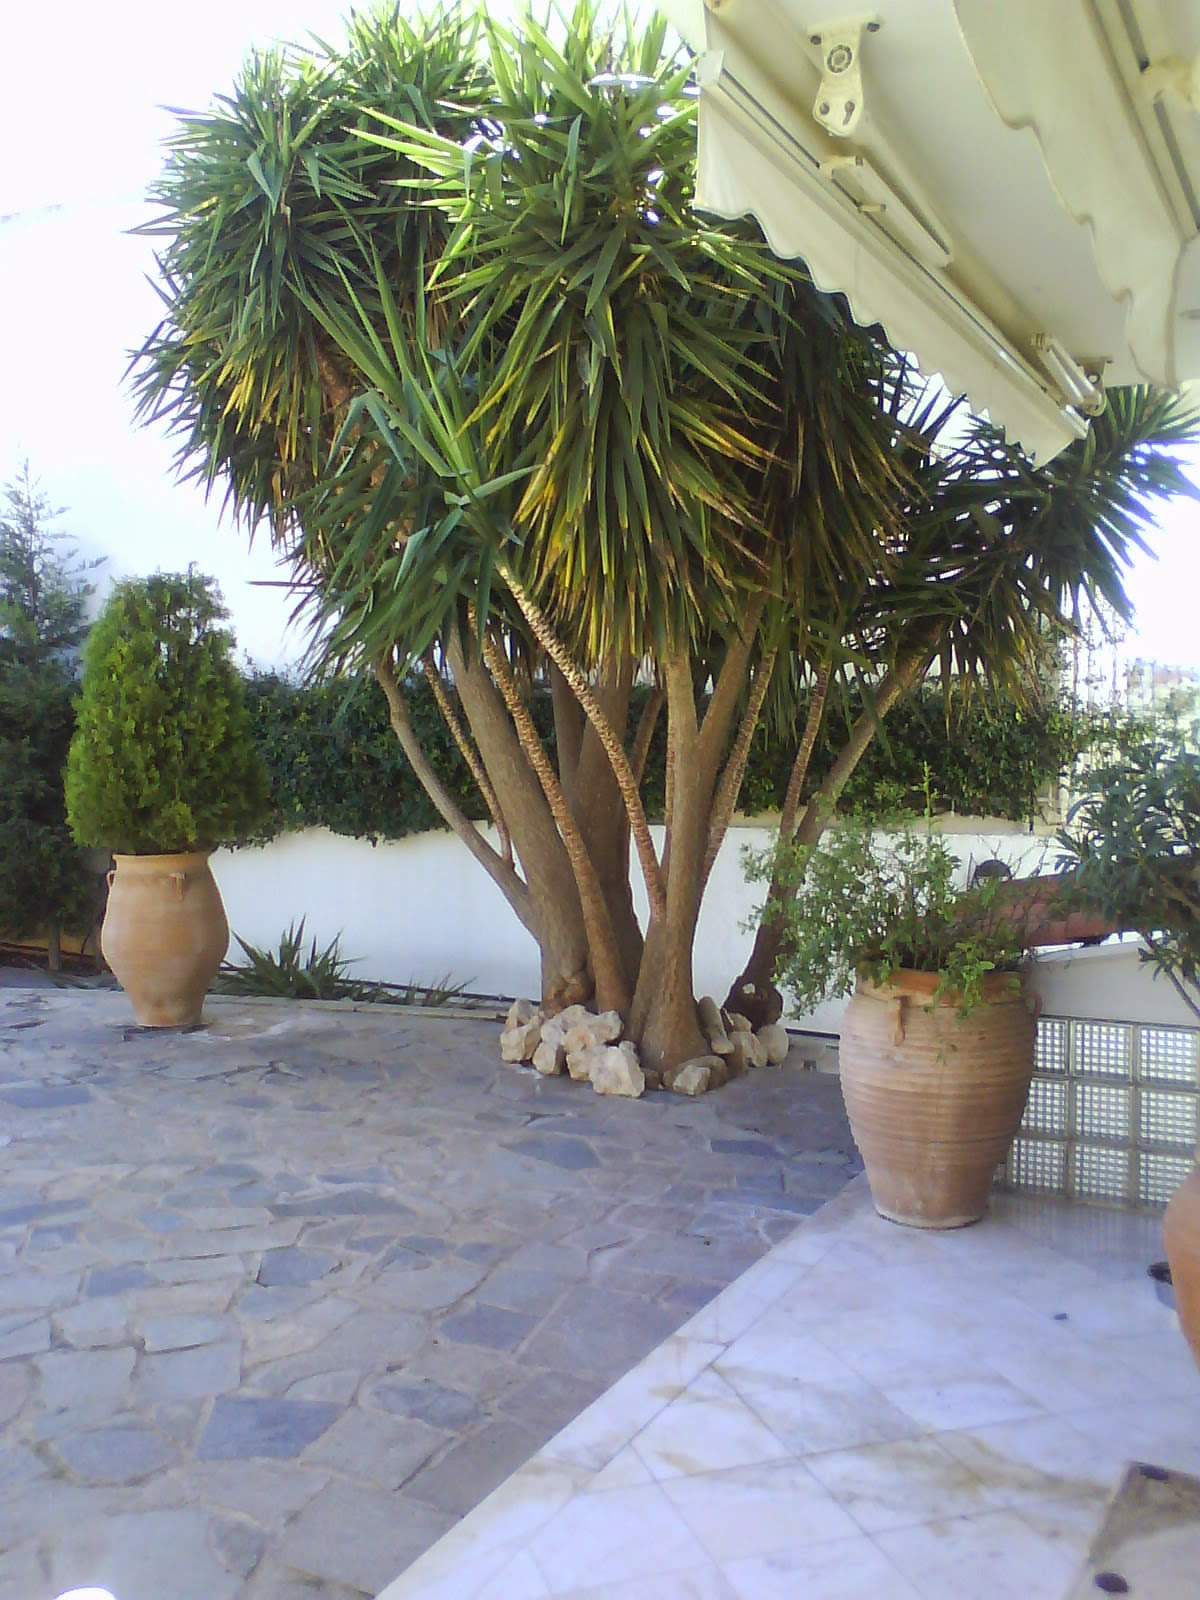 Huge yucca tree